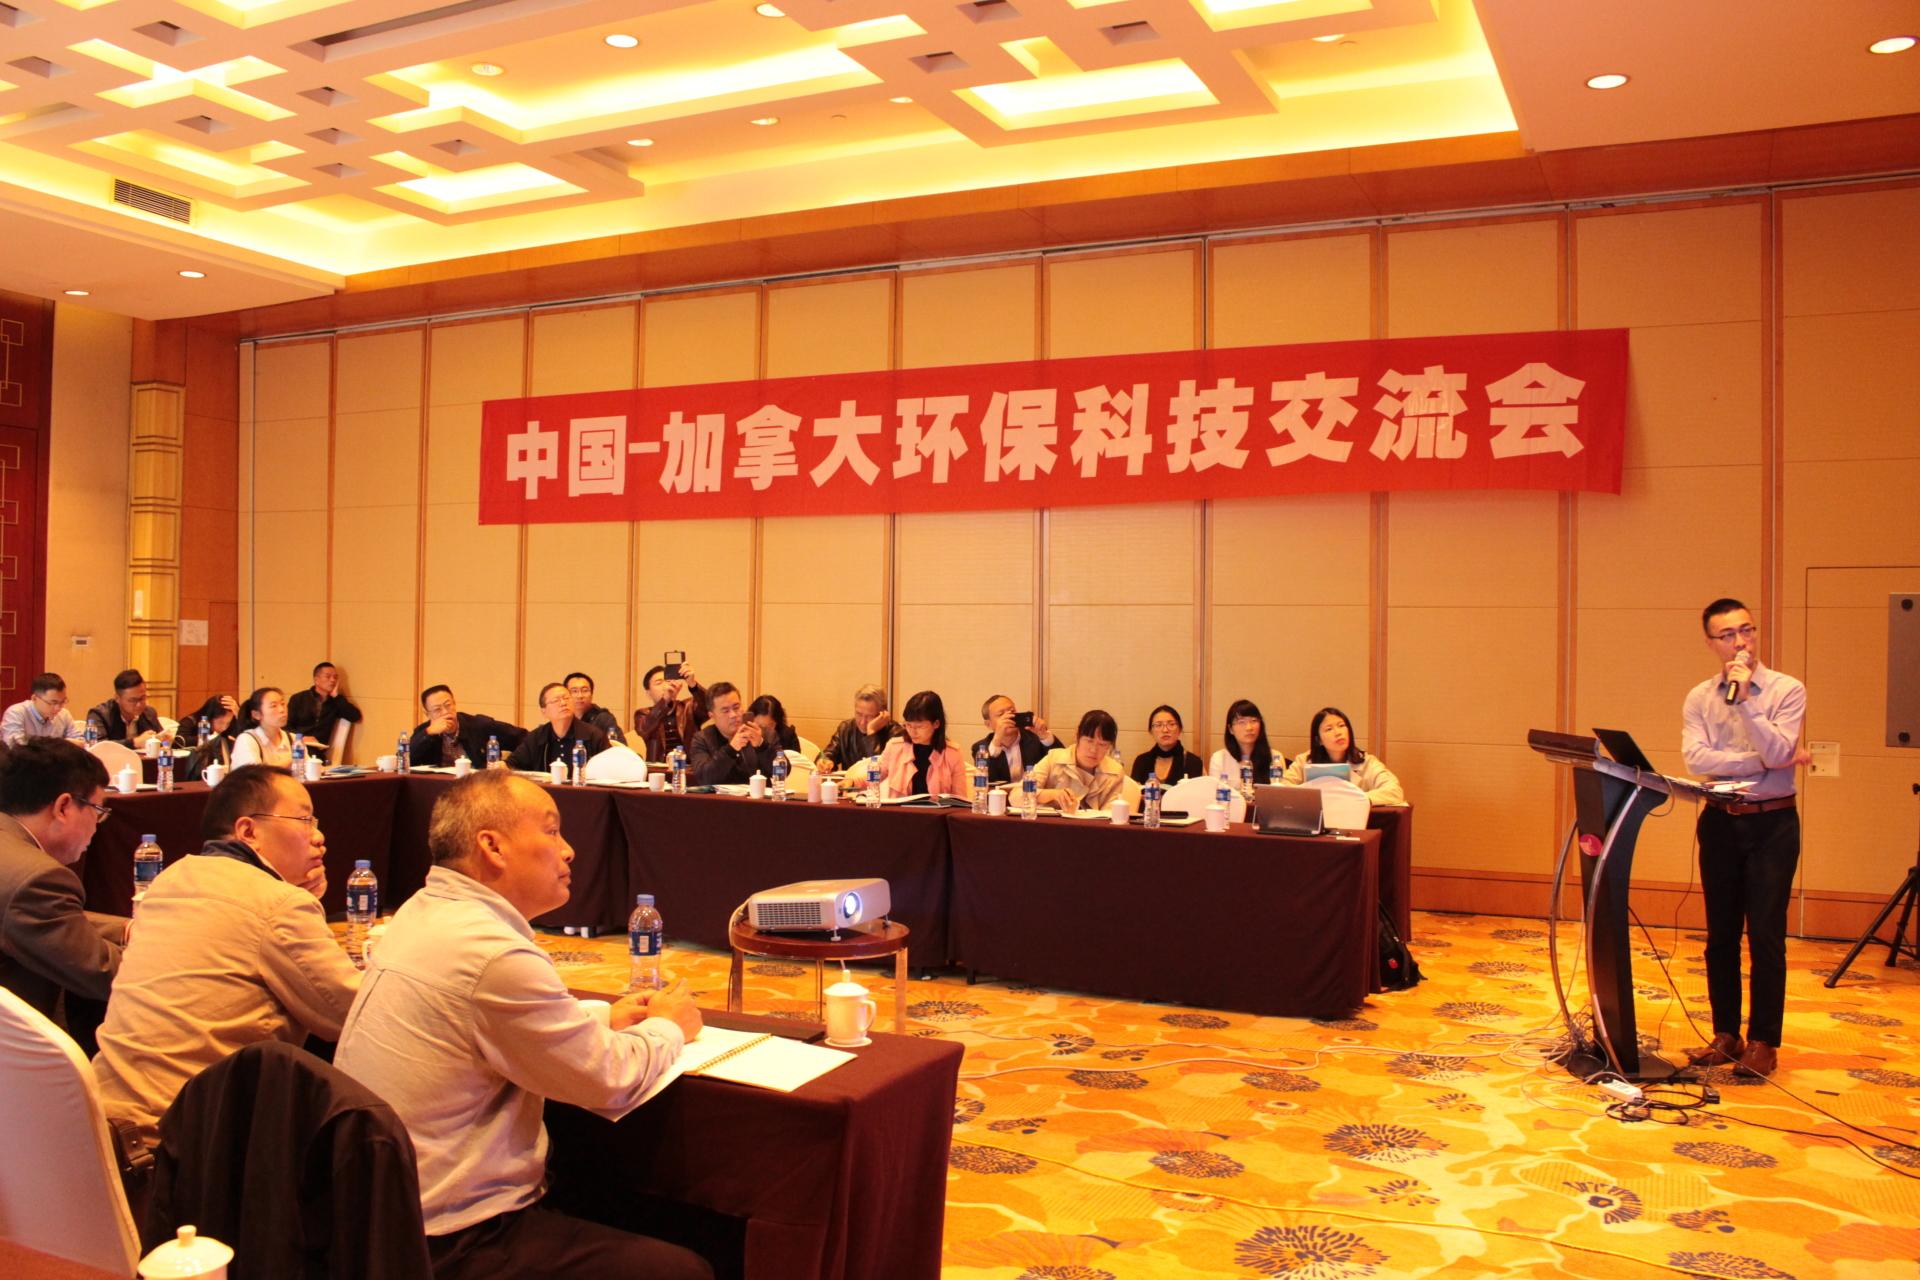 Cross-border Clean-tech Seminar with Zhejiang EP Public Sci-Tech Innovation Service Platform